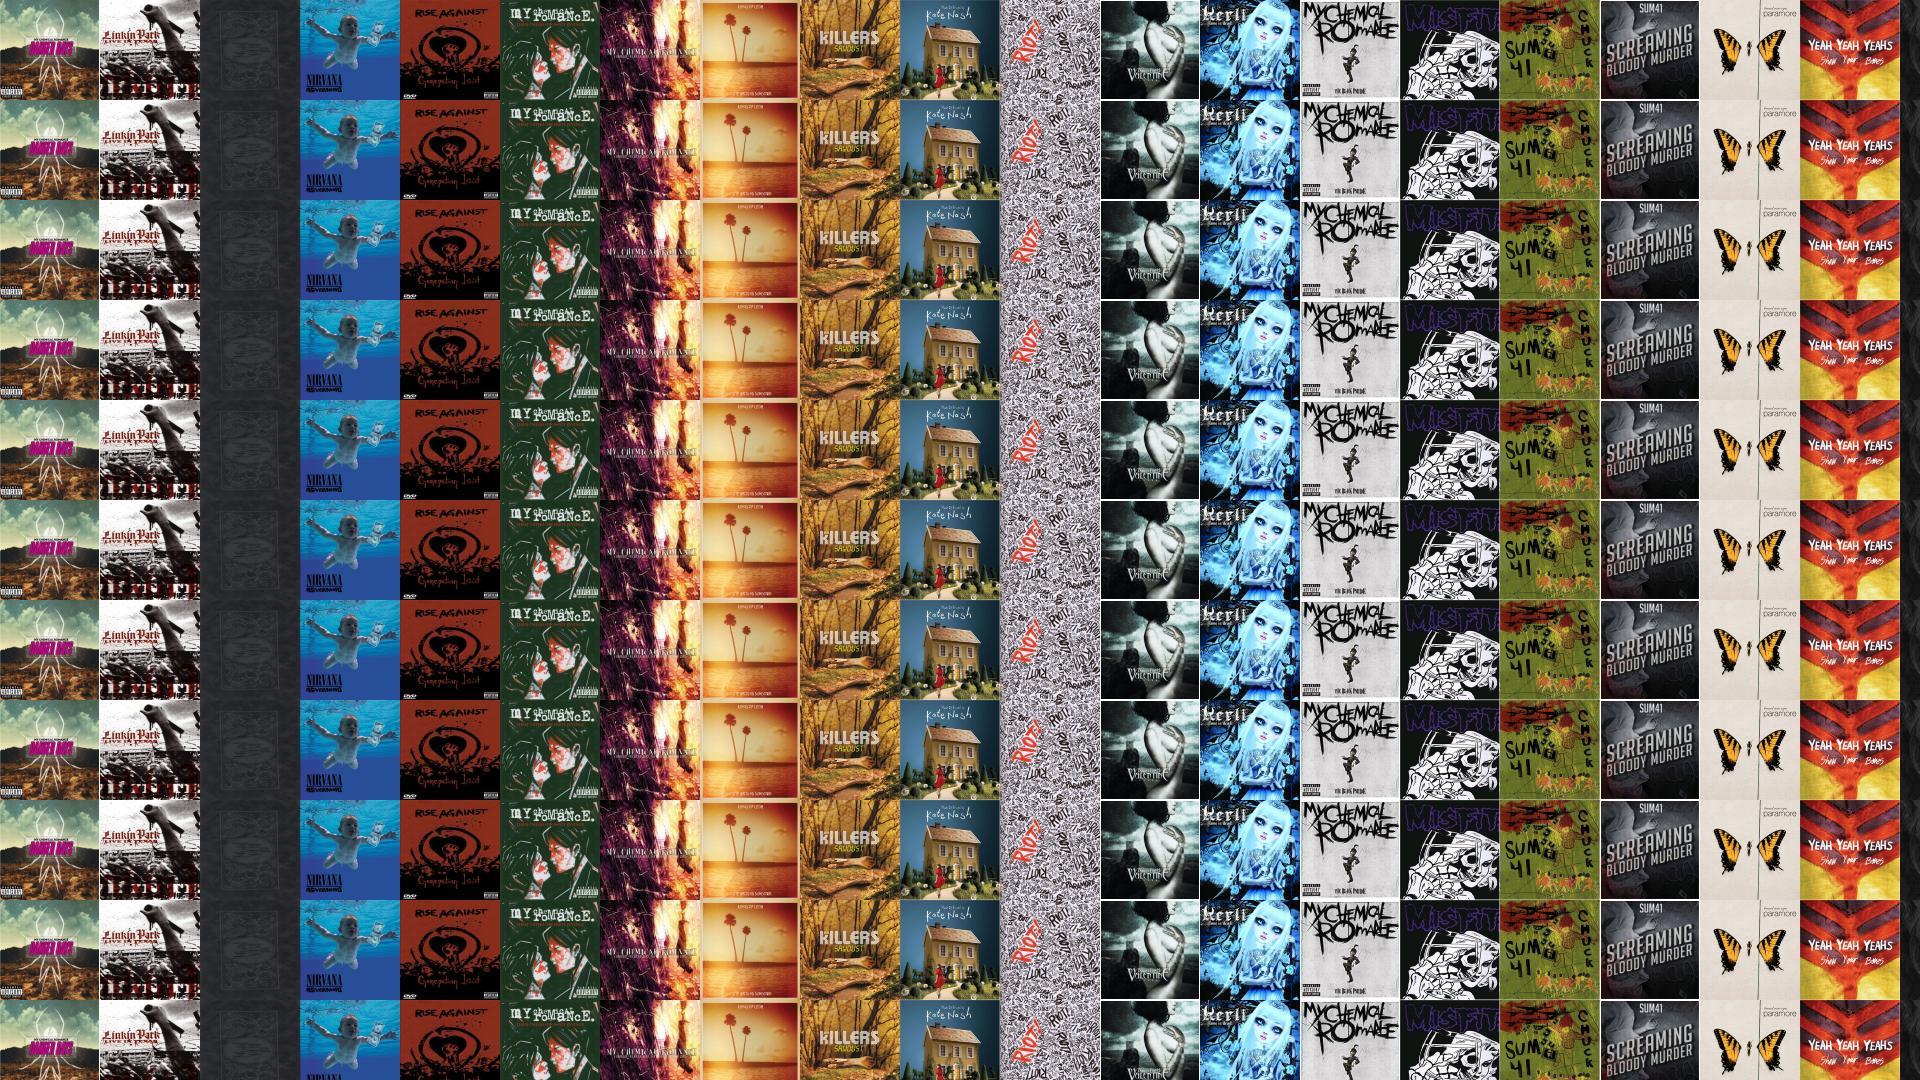 Fall Out Boy Laptop Wallpaper My Chemical Romance Danger Days Linkin Park Live Wallpaper